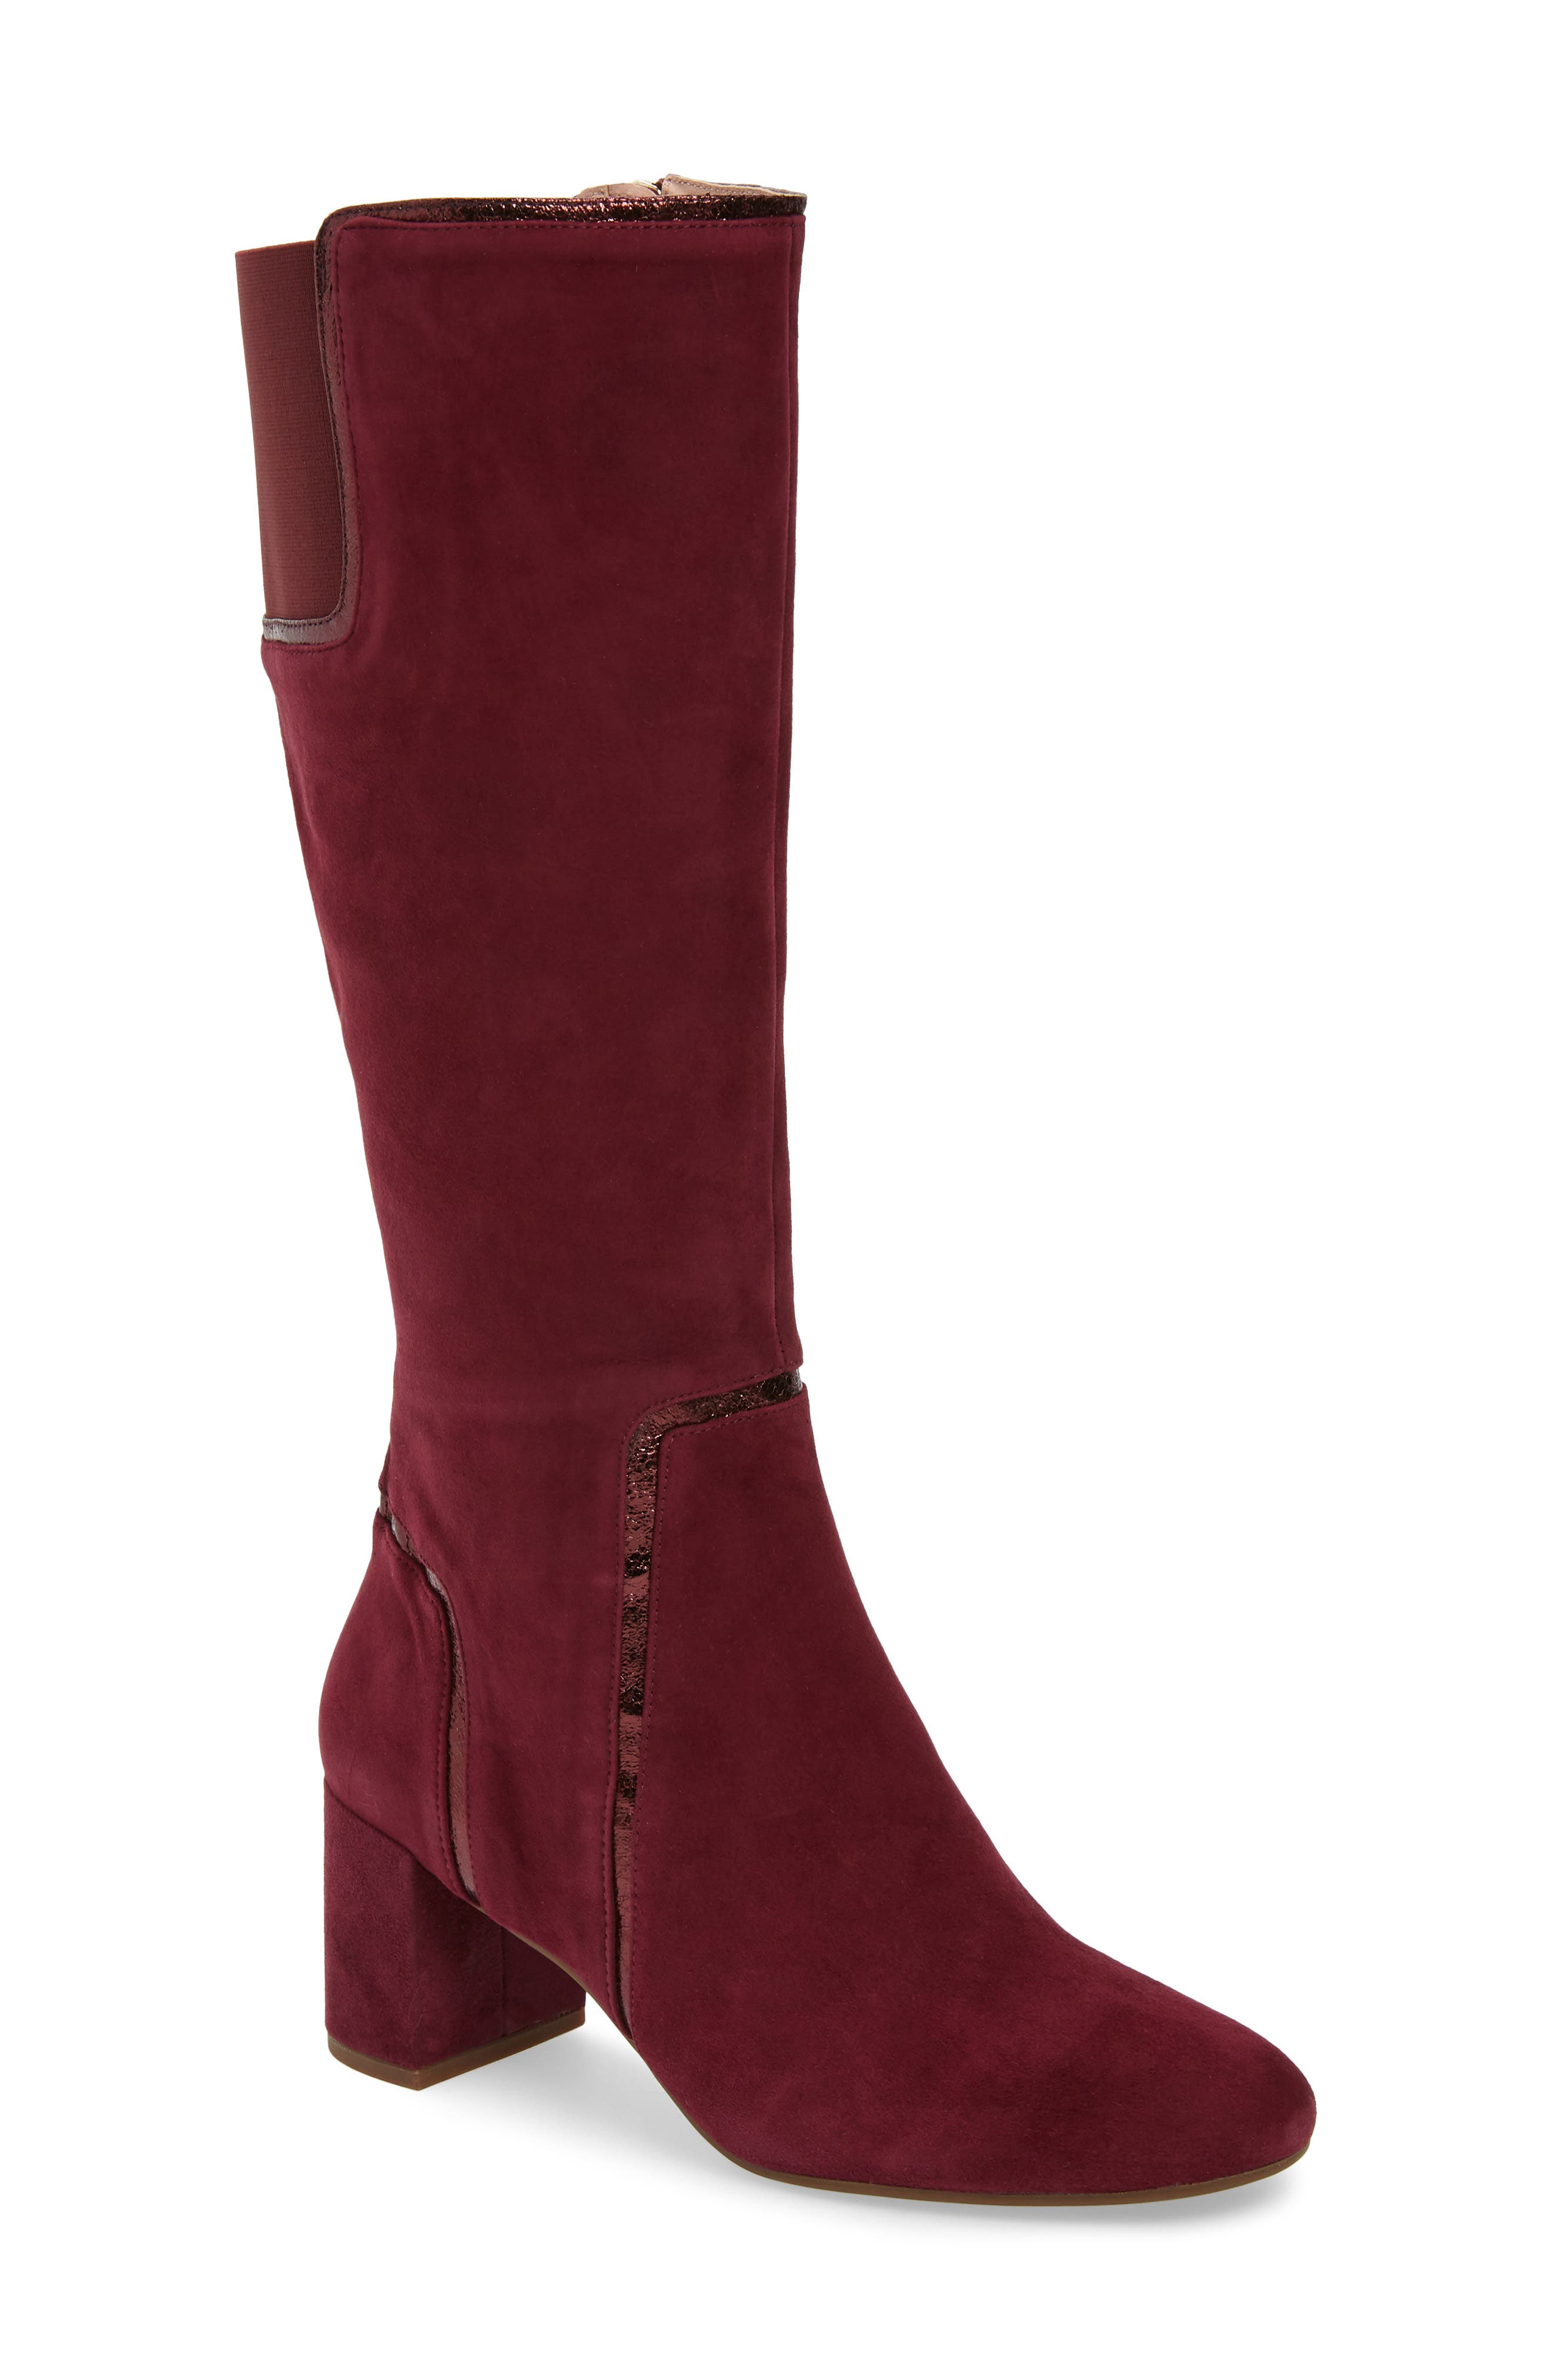 Taryn Rose Charlee Knee High Boot, Red